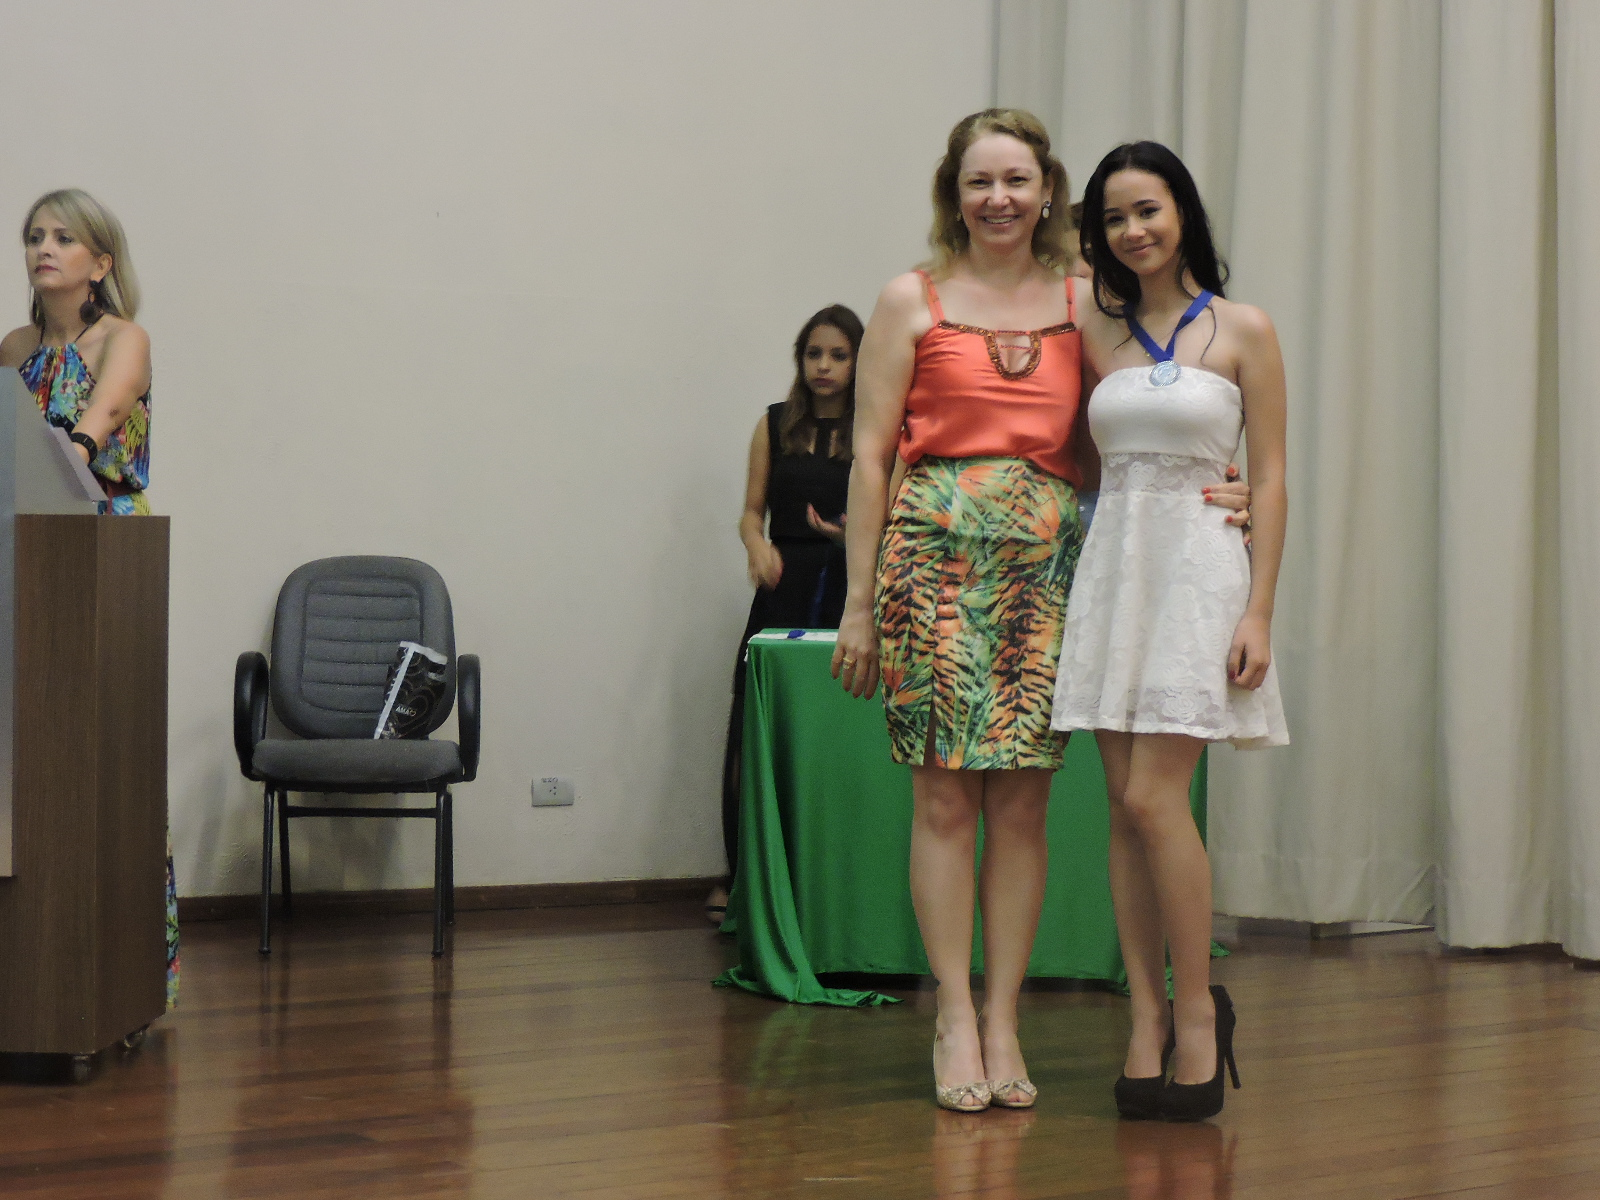 2º lugar B - Interpretação - Bianca da Silva - 9ºEC